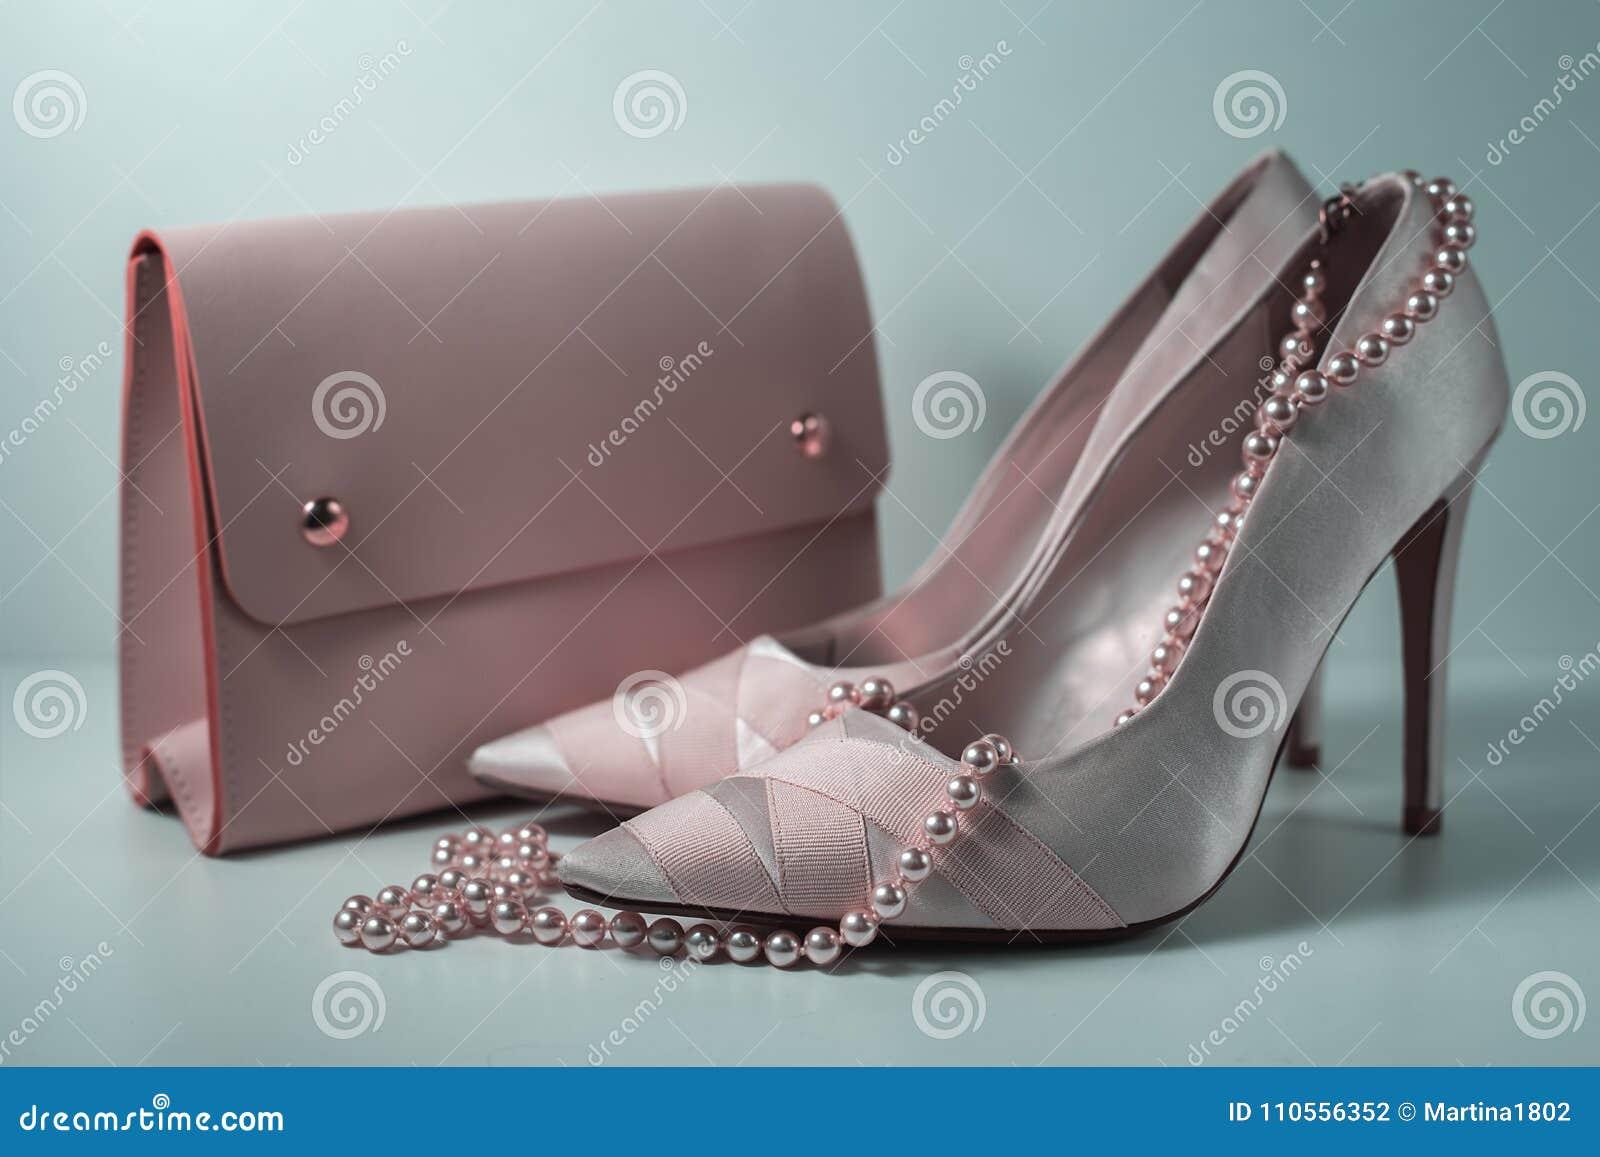 df349d56db9c Fashion Design Woman Accessories Set. Pastel Colors.Trendy fashion Handbag  Clutch clothes. Glamor fashion shoes Heels.